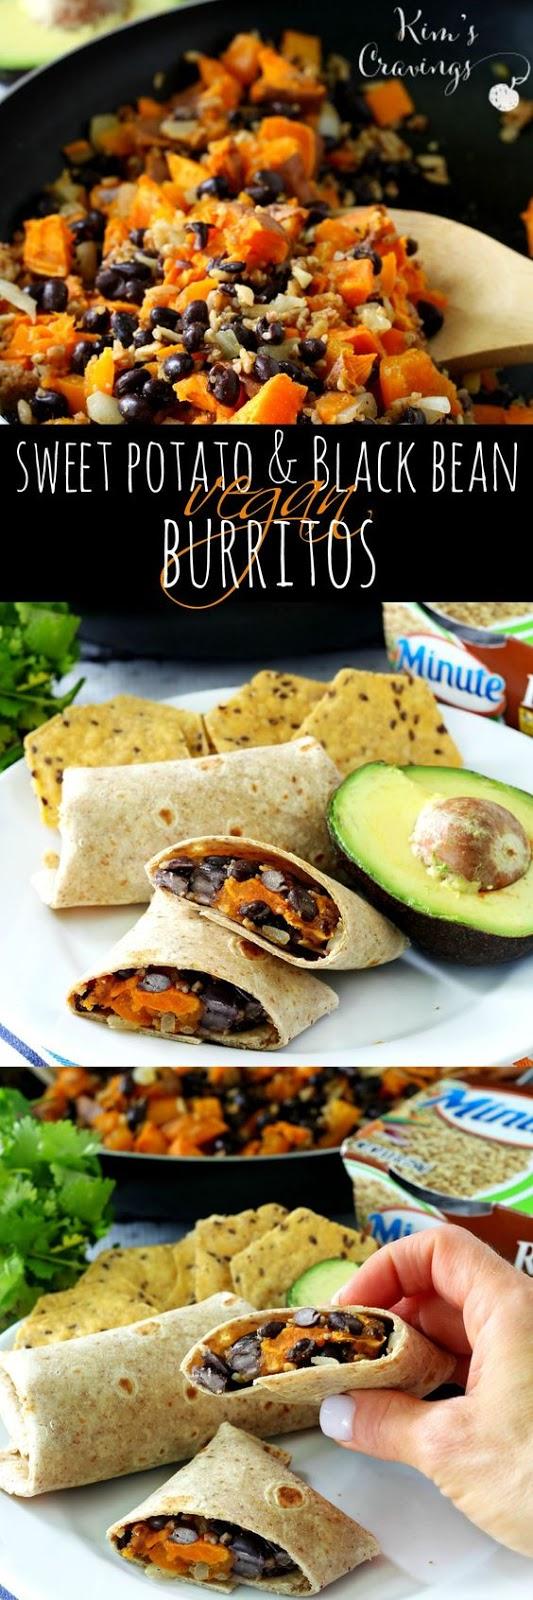 Sweet Potato And Black Bean Vegan Burritos #sweetpotato #potato #blackbean #burritos #vegan #veggies #veganrecipes